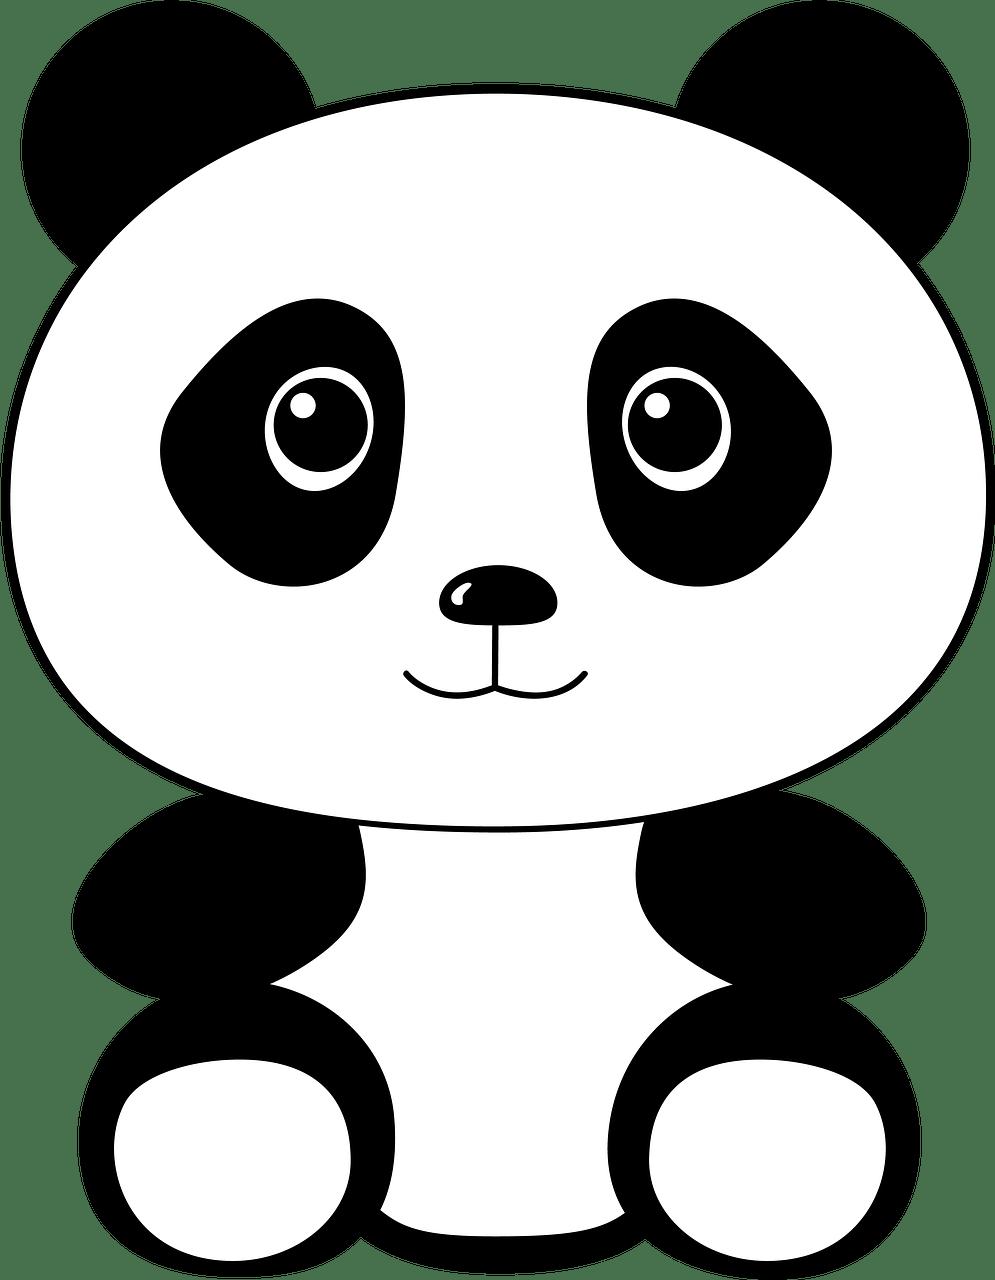 Panda Cute Animals Free Image On Pixabay